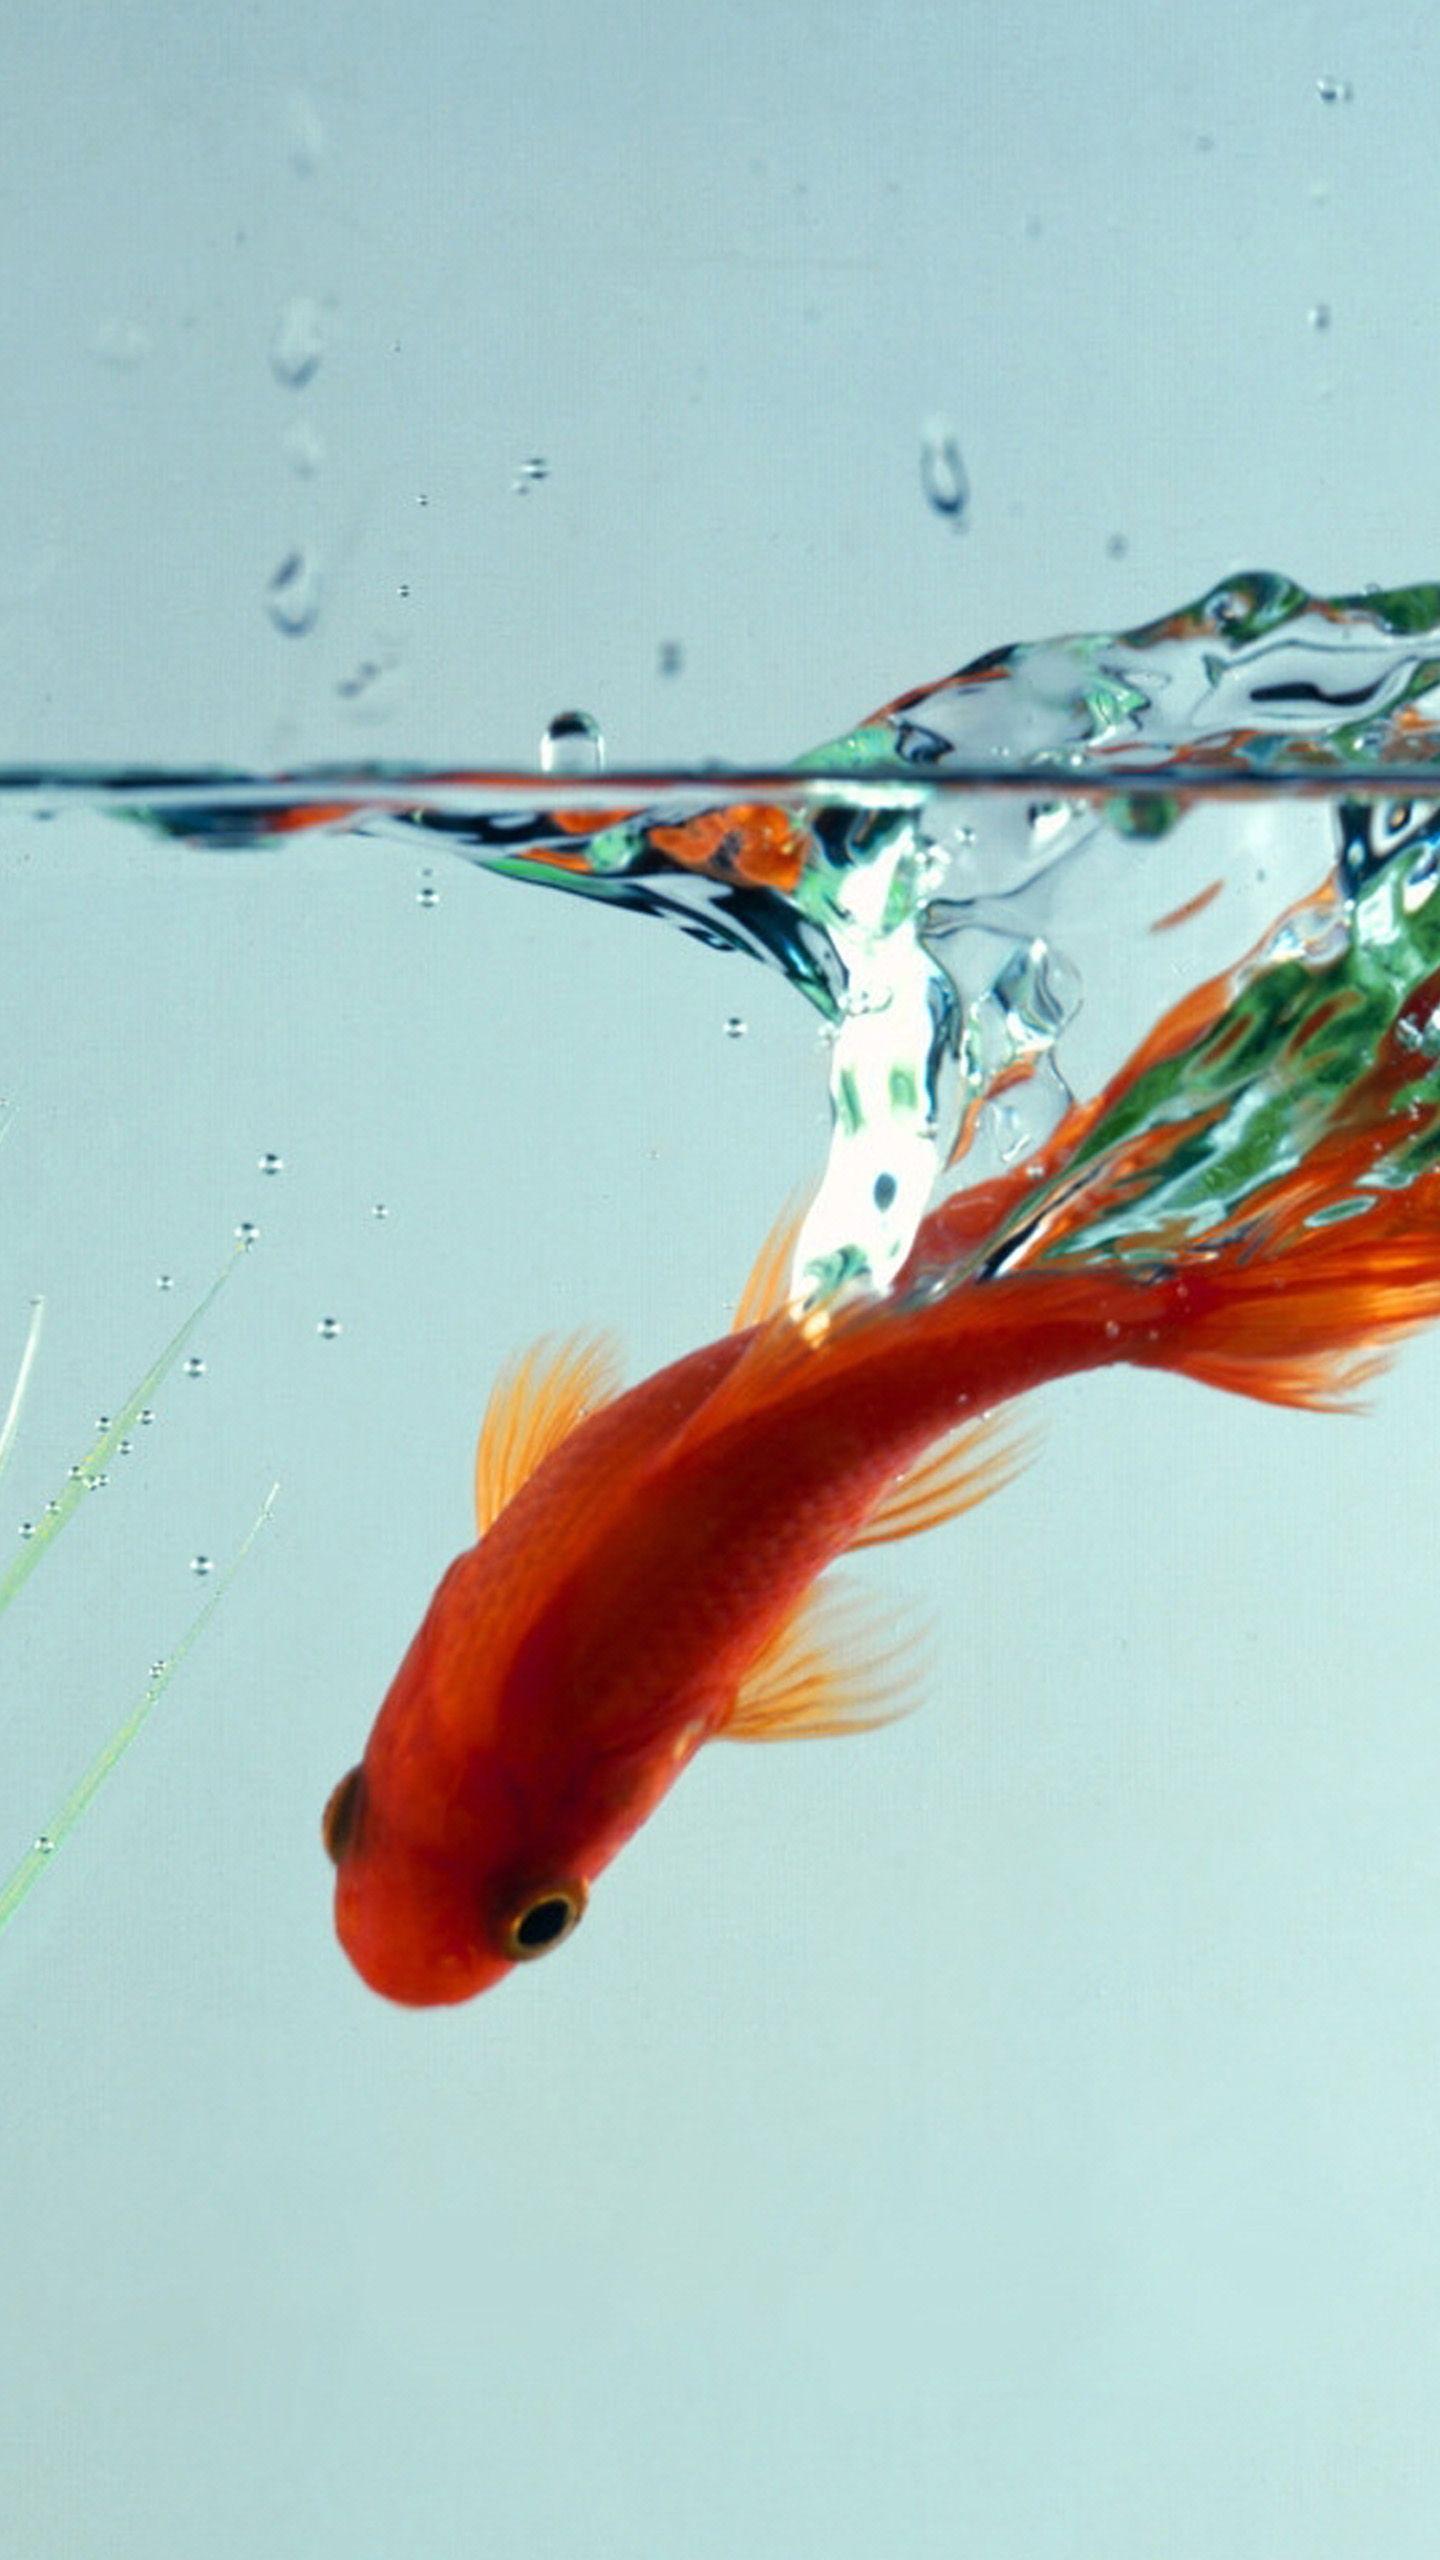 Pin by ali mohamed on metal gear fish wallpaper fish - Carp wallpaper iphone ...